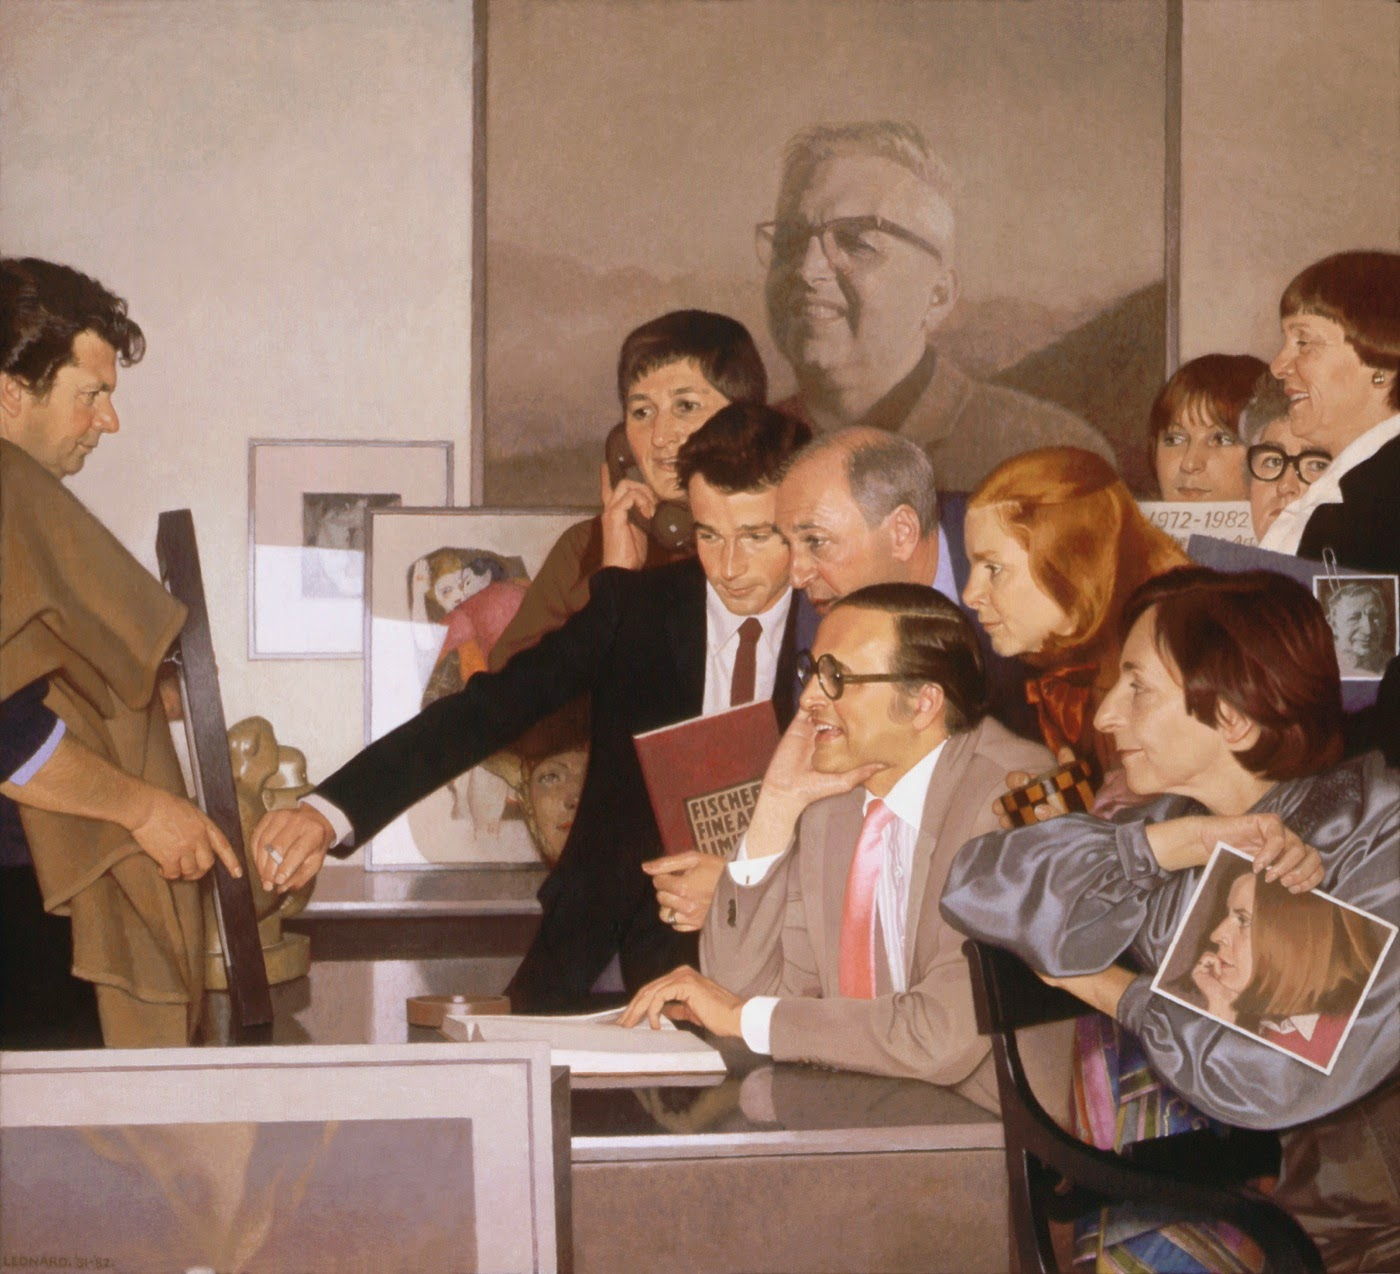 nuncalosabre.Pinturas. Paintings - Michael Leonard